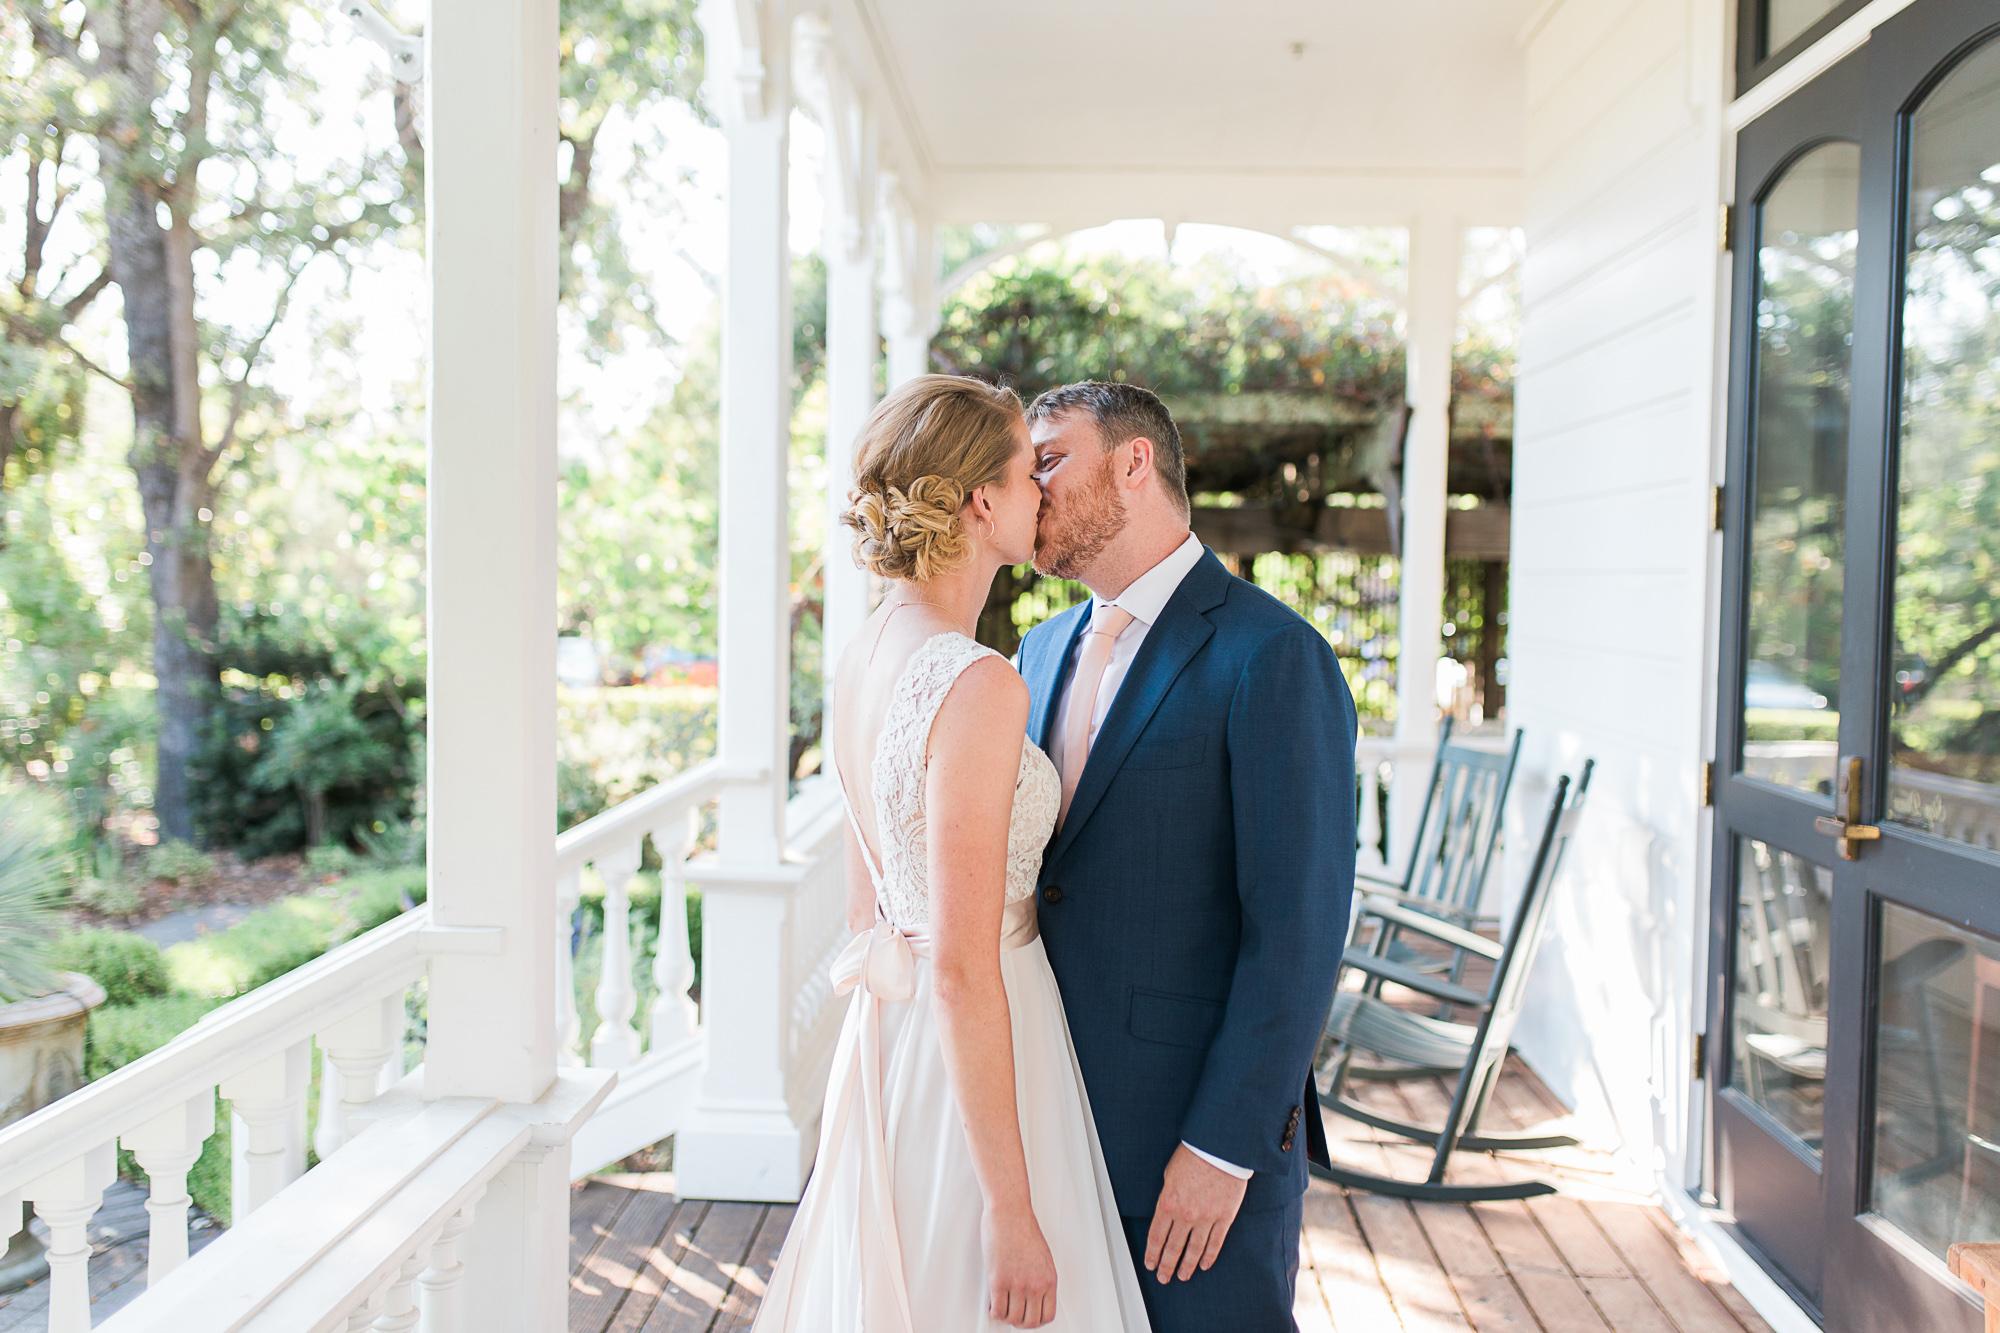 Generals Daughter Wedding Photos by JBJ Pictures - Ramekins Wedding Venue Photographer in Sonoma, Napa (6).jpg